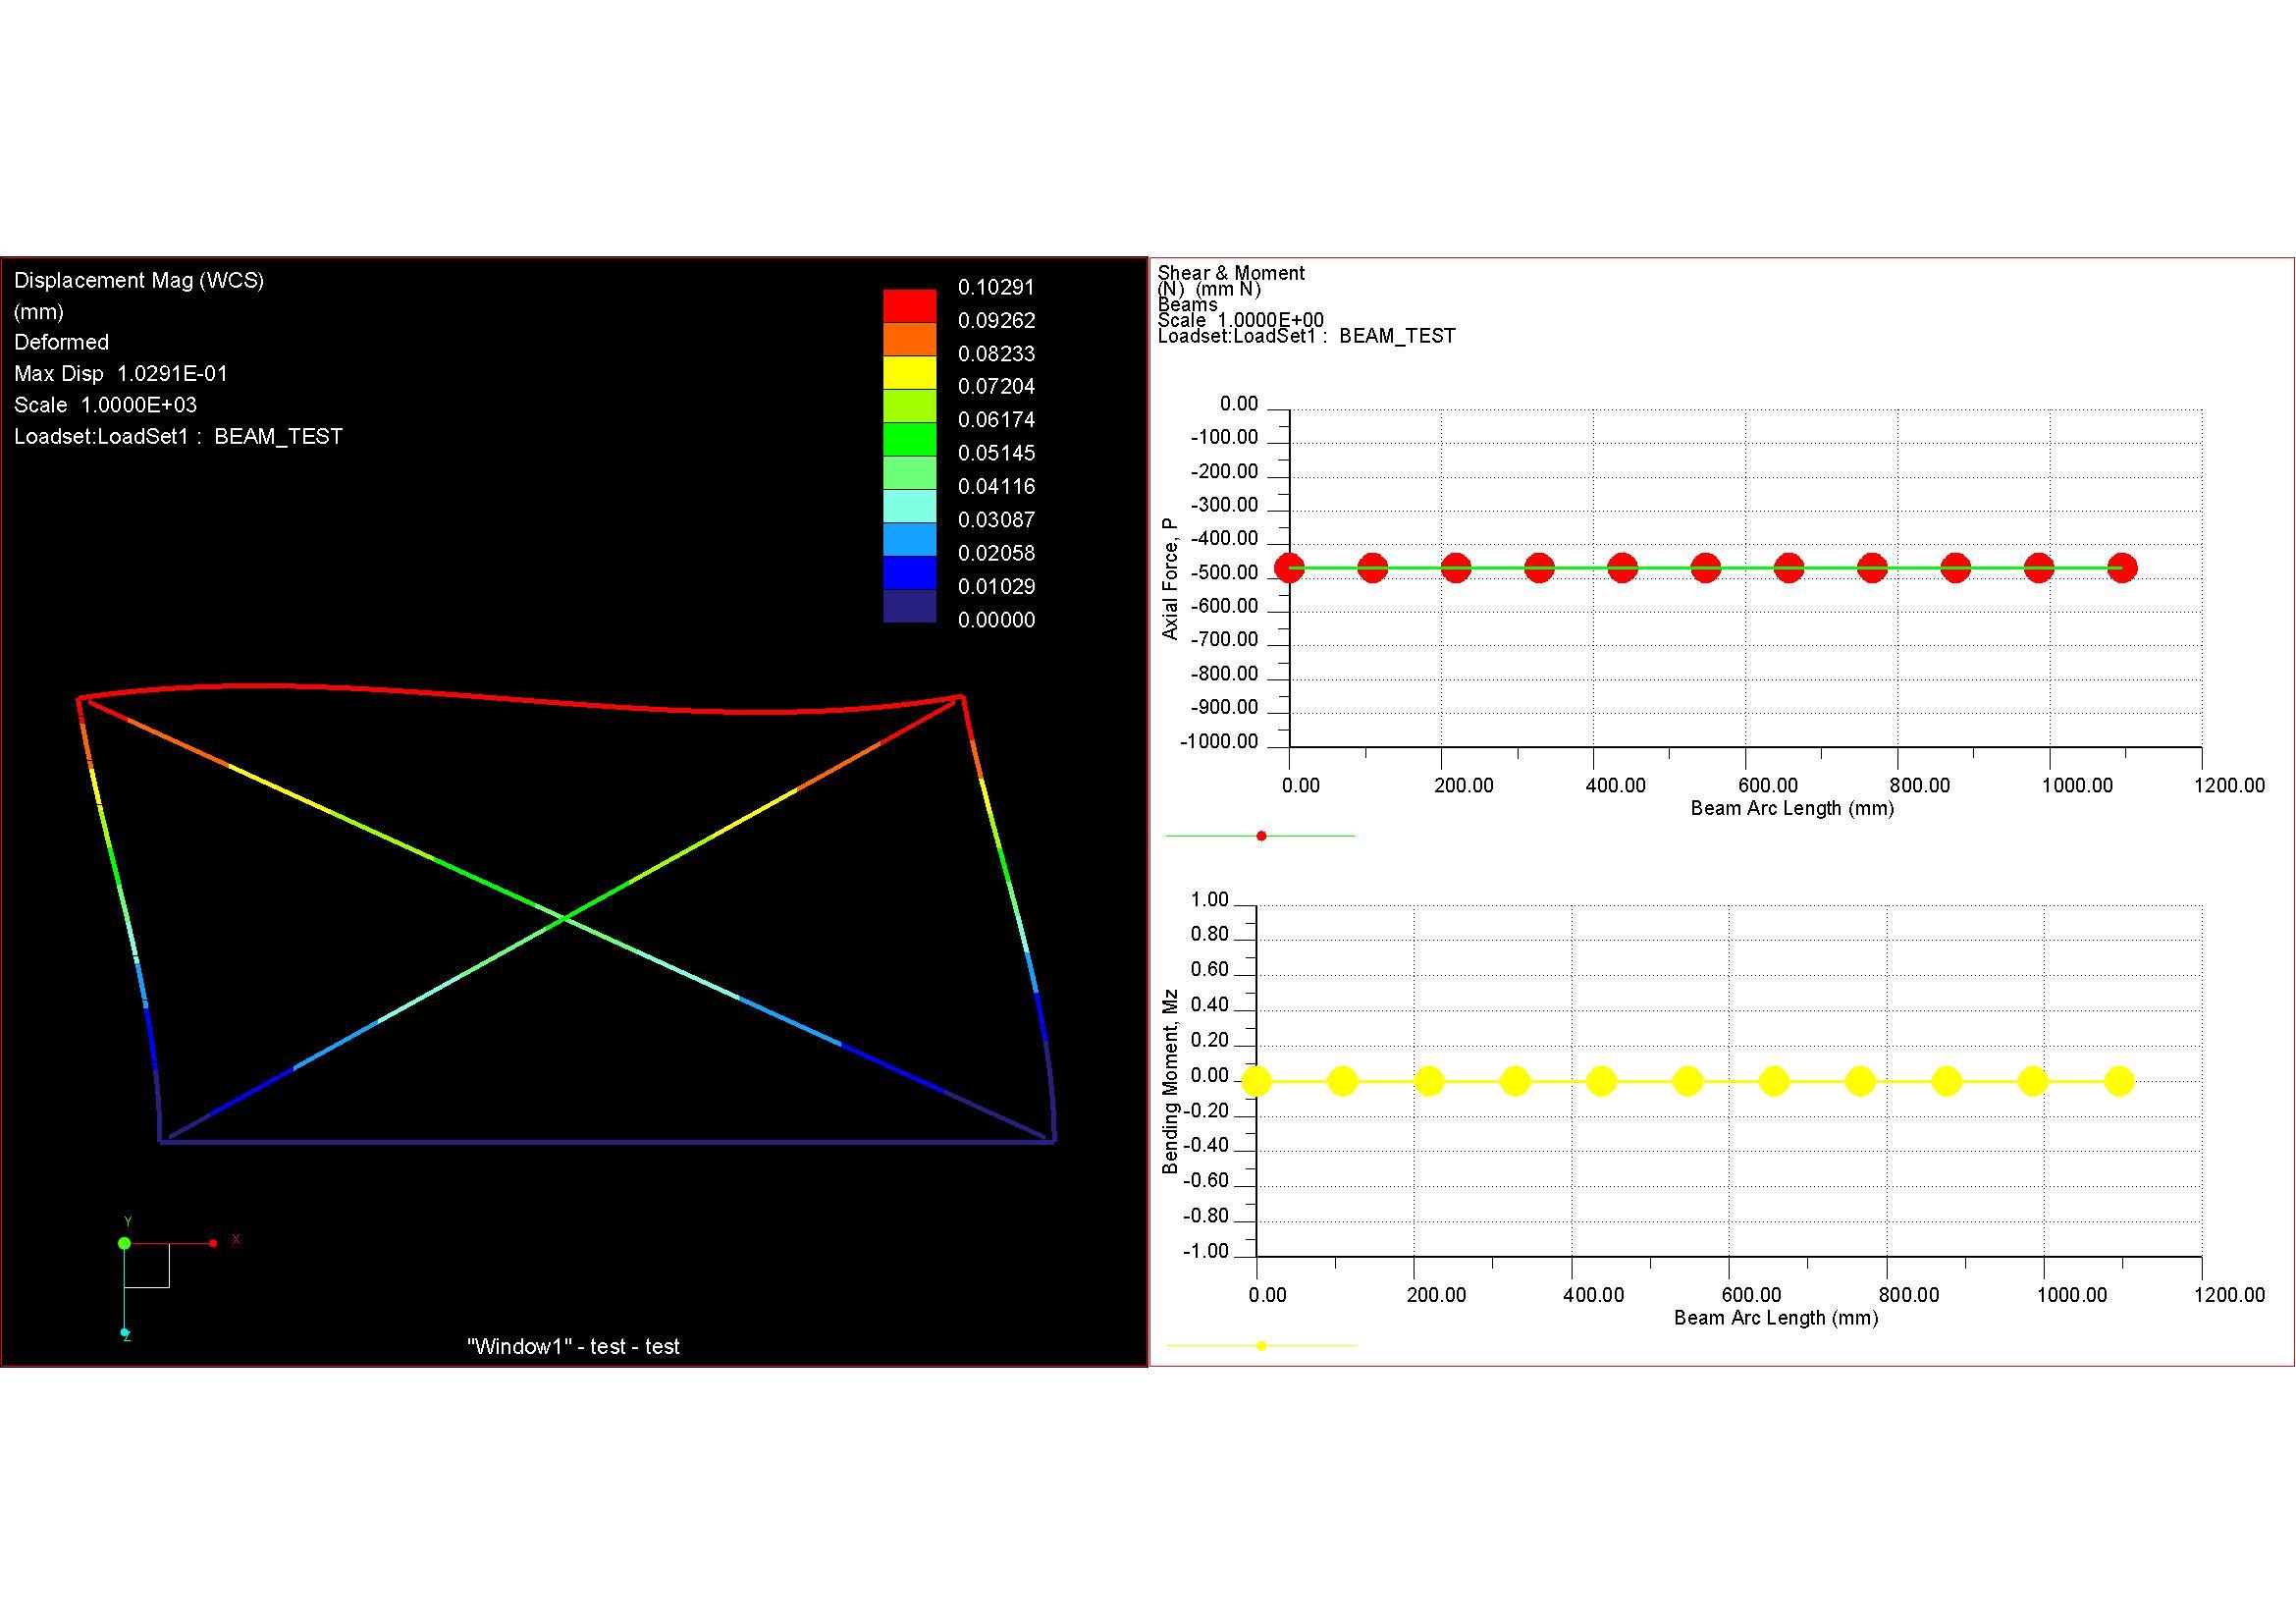 beam_plot.jpg